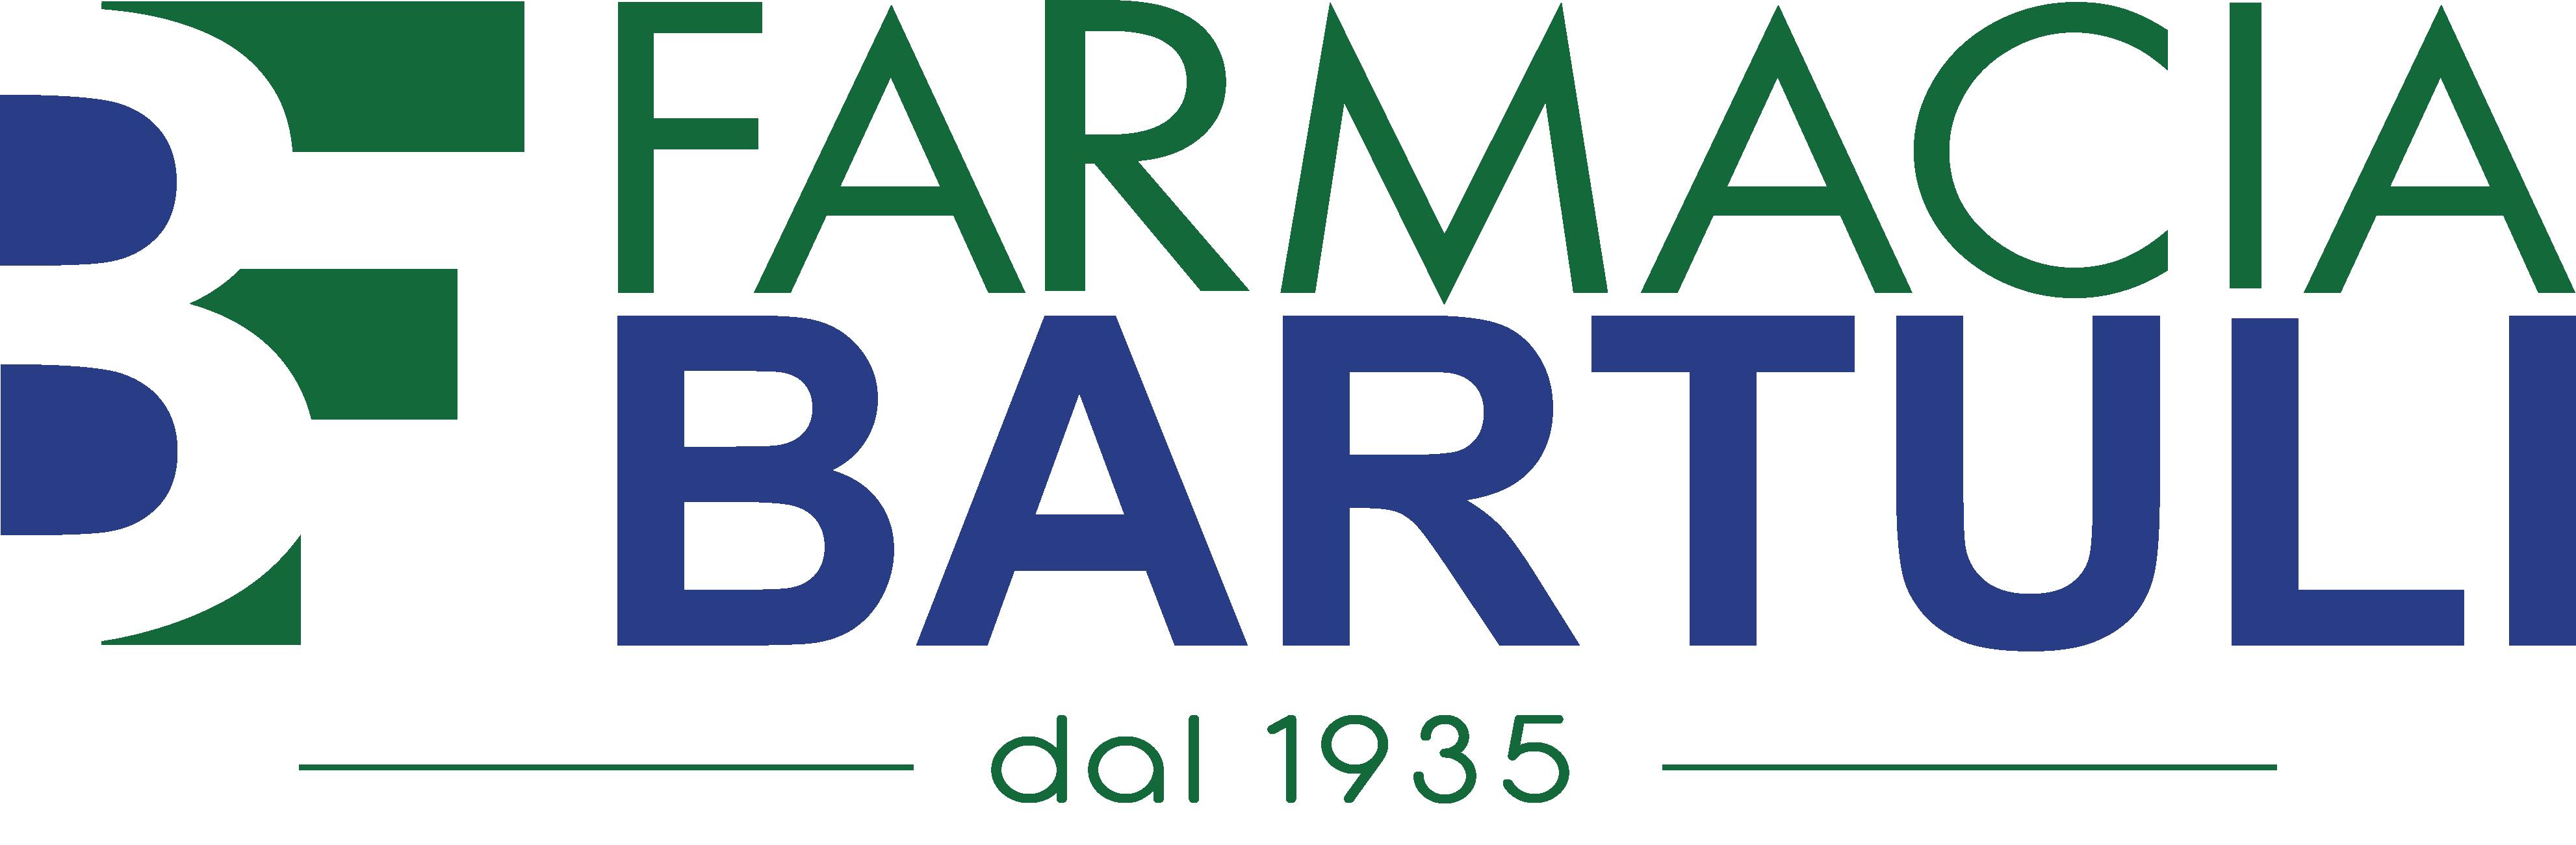 Farmacia Bartuli Roma